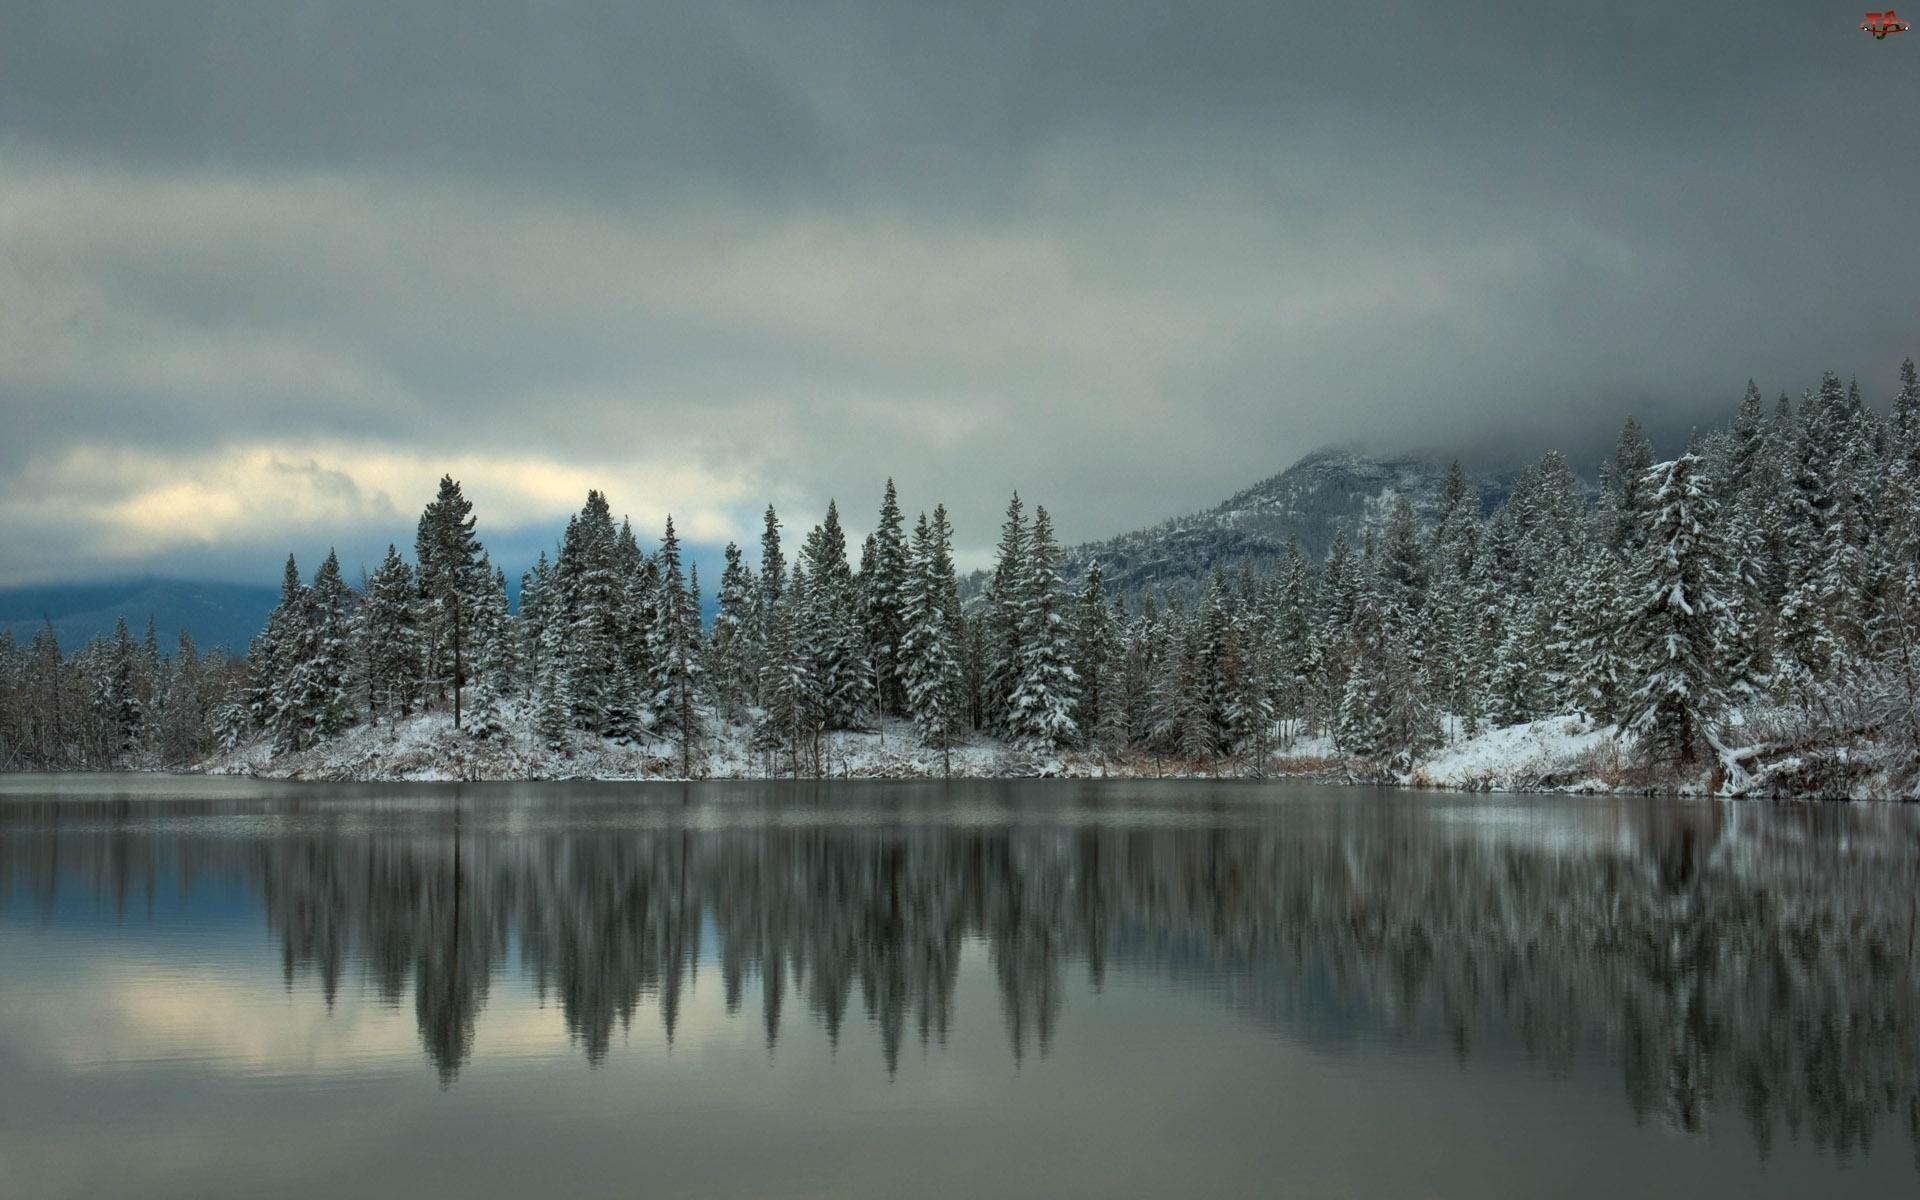 Góry, Zima, Las, Jezioro